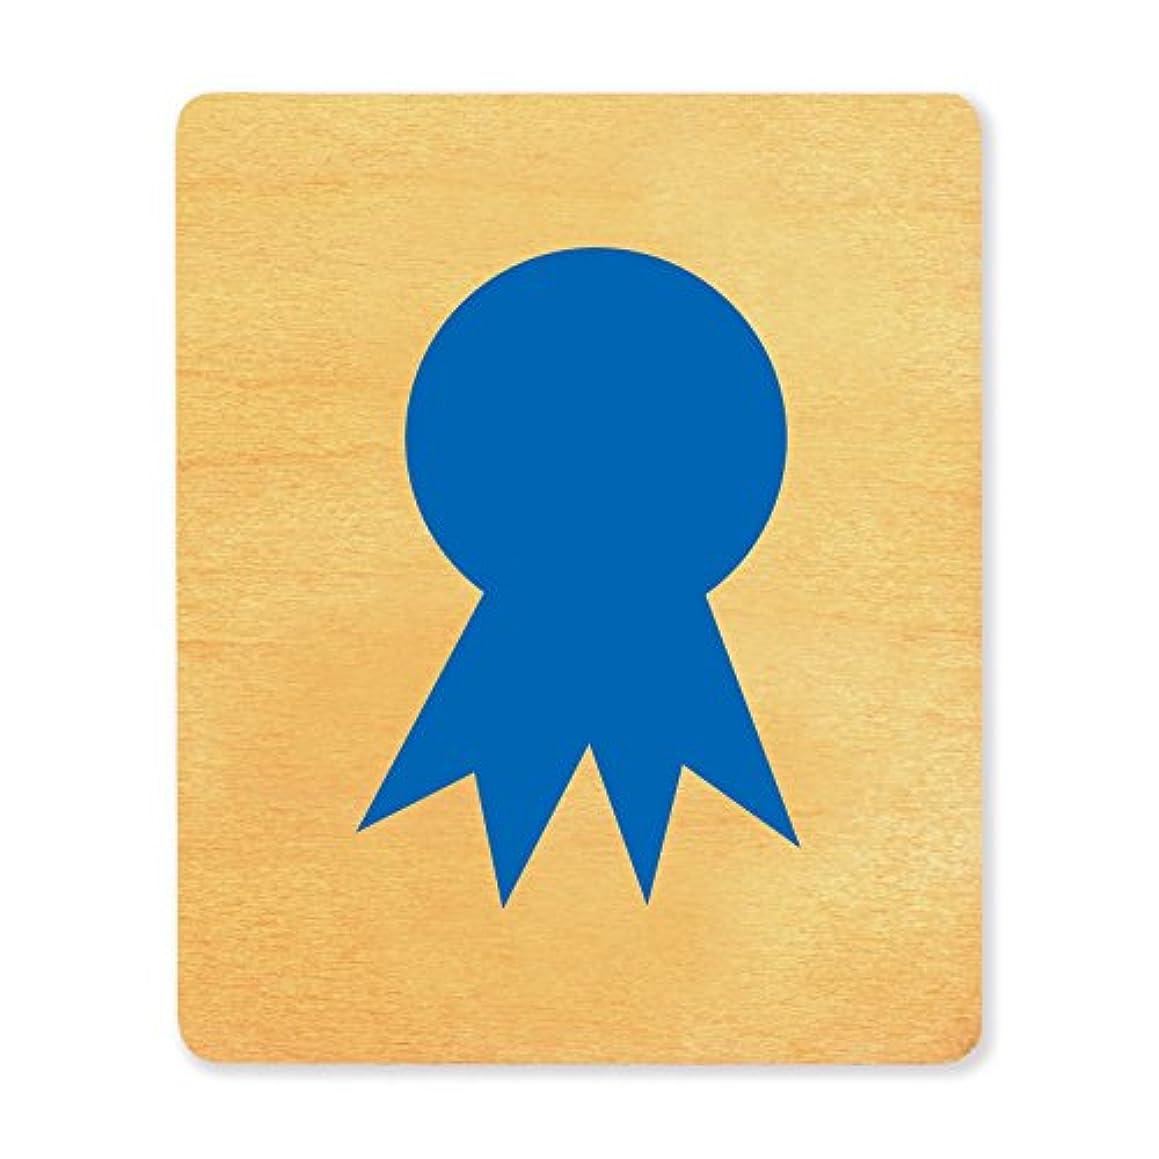 Ellison SureCut Die, Award #1B, Large